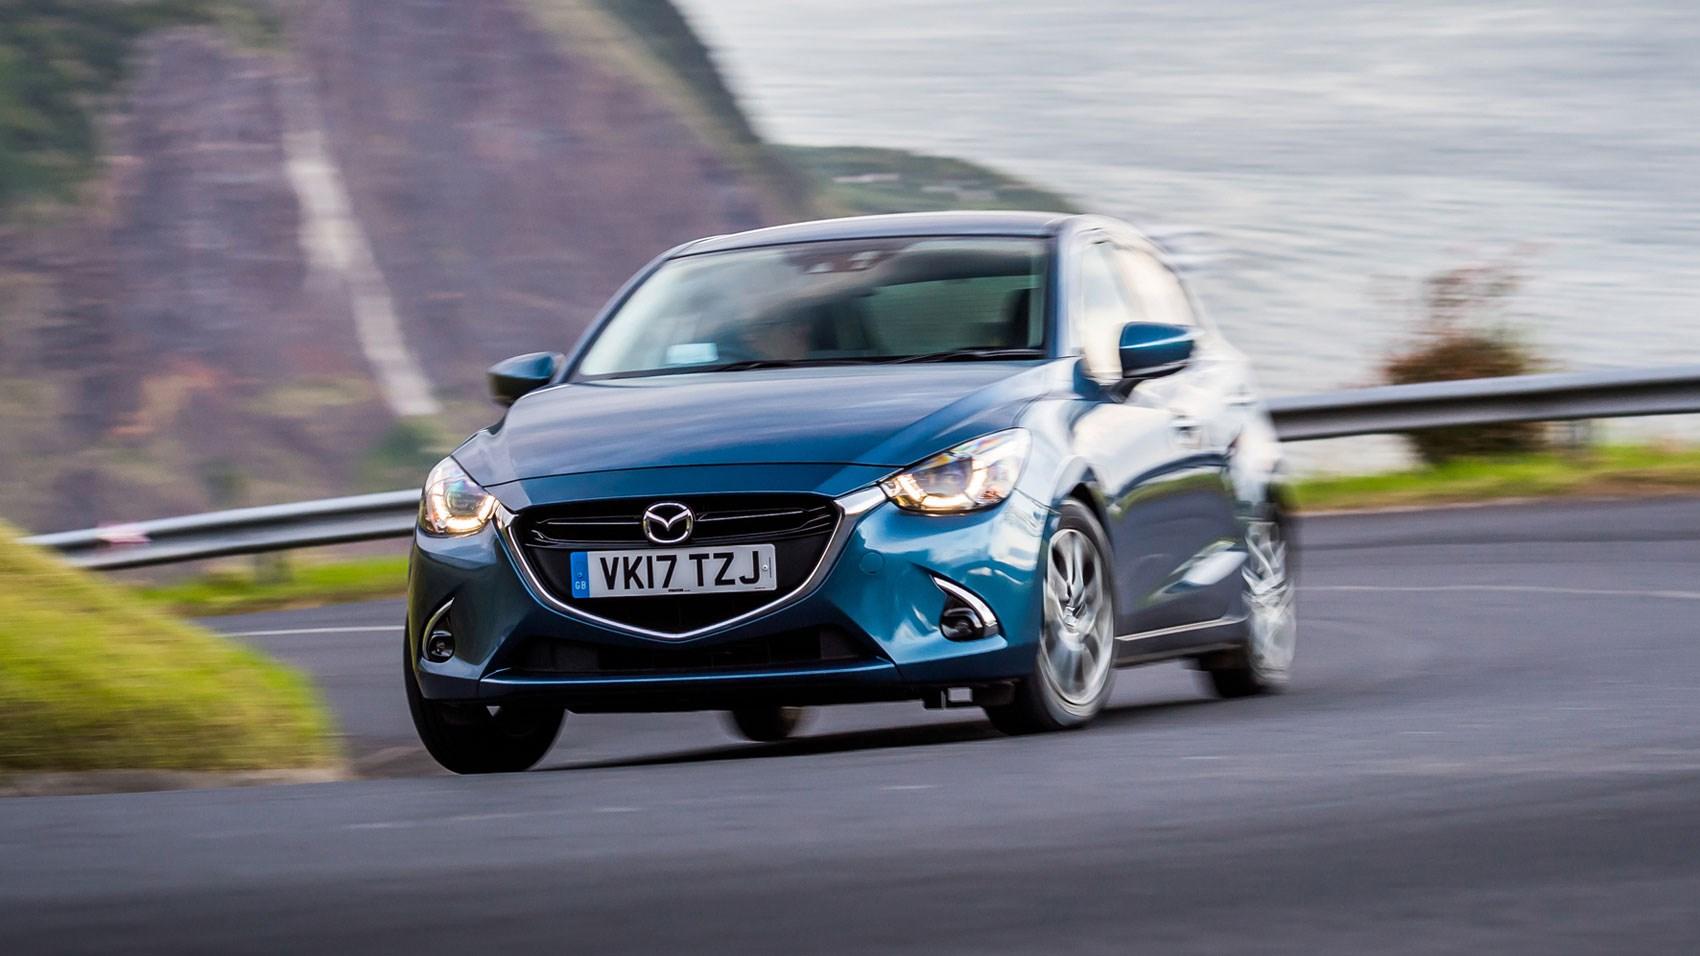 mazda 2 1.5 115hp gt sport (2017) review | car magazine